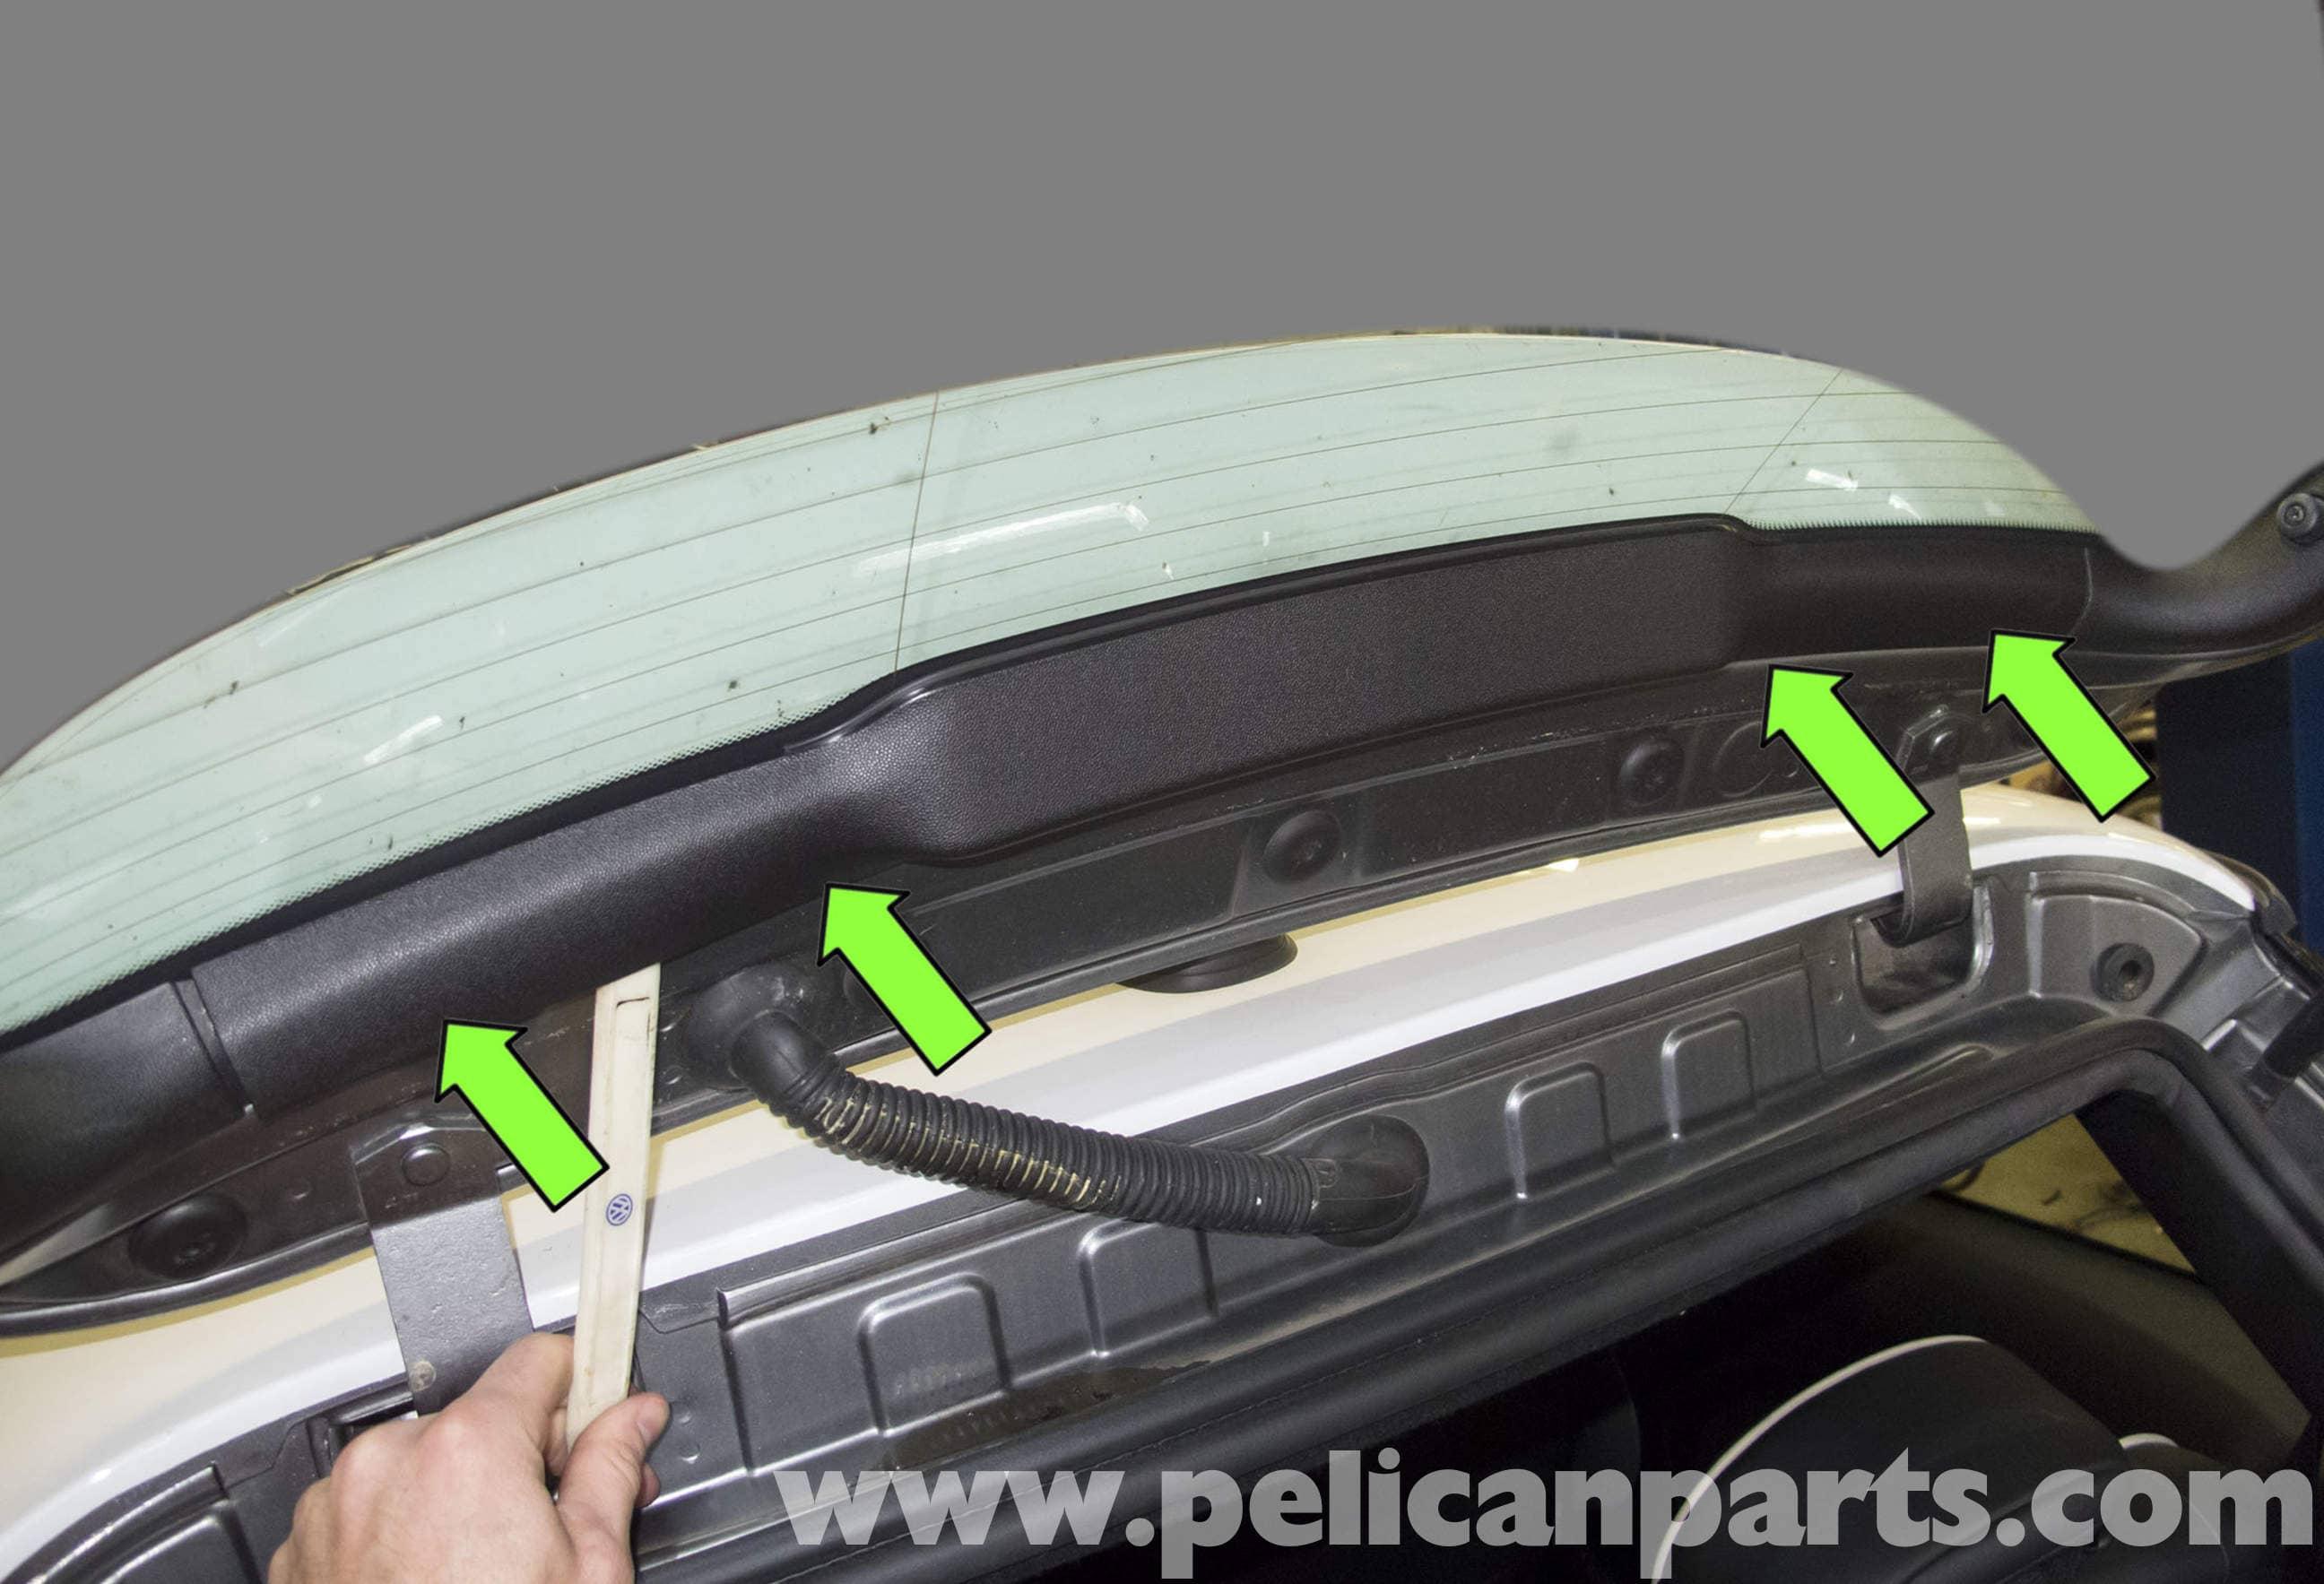 Mini cooper r56 third brake and license plate lights replacement large image extra large image third brake light aloadofball Gallery